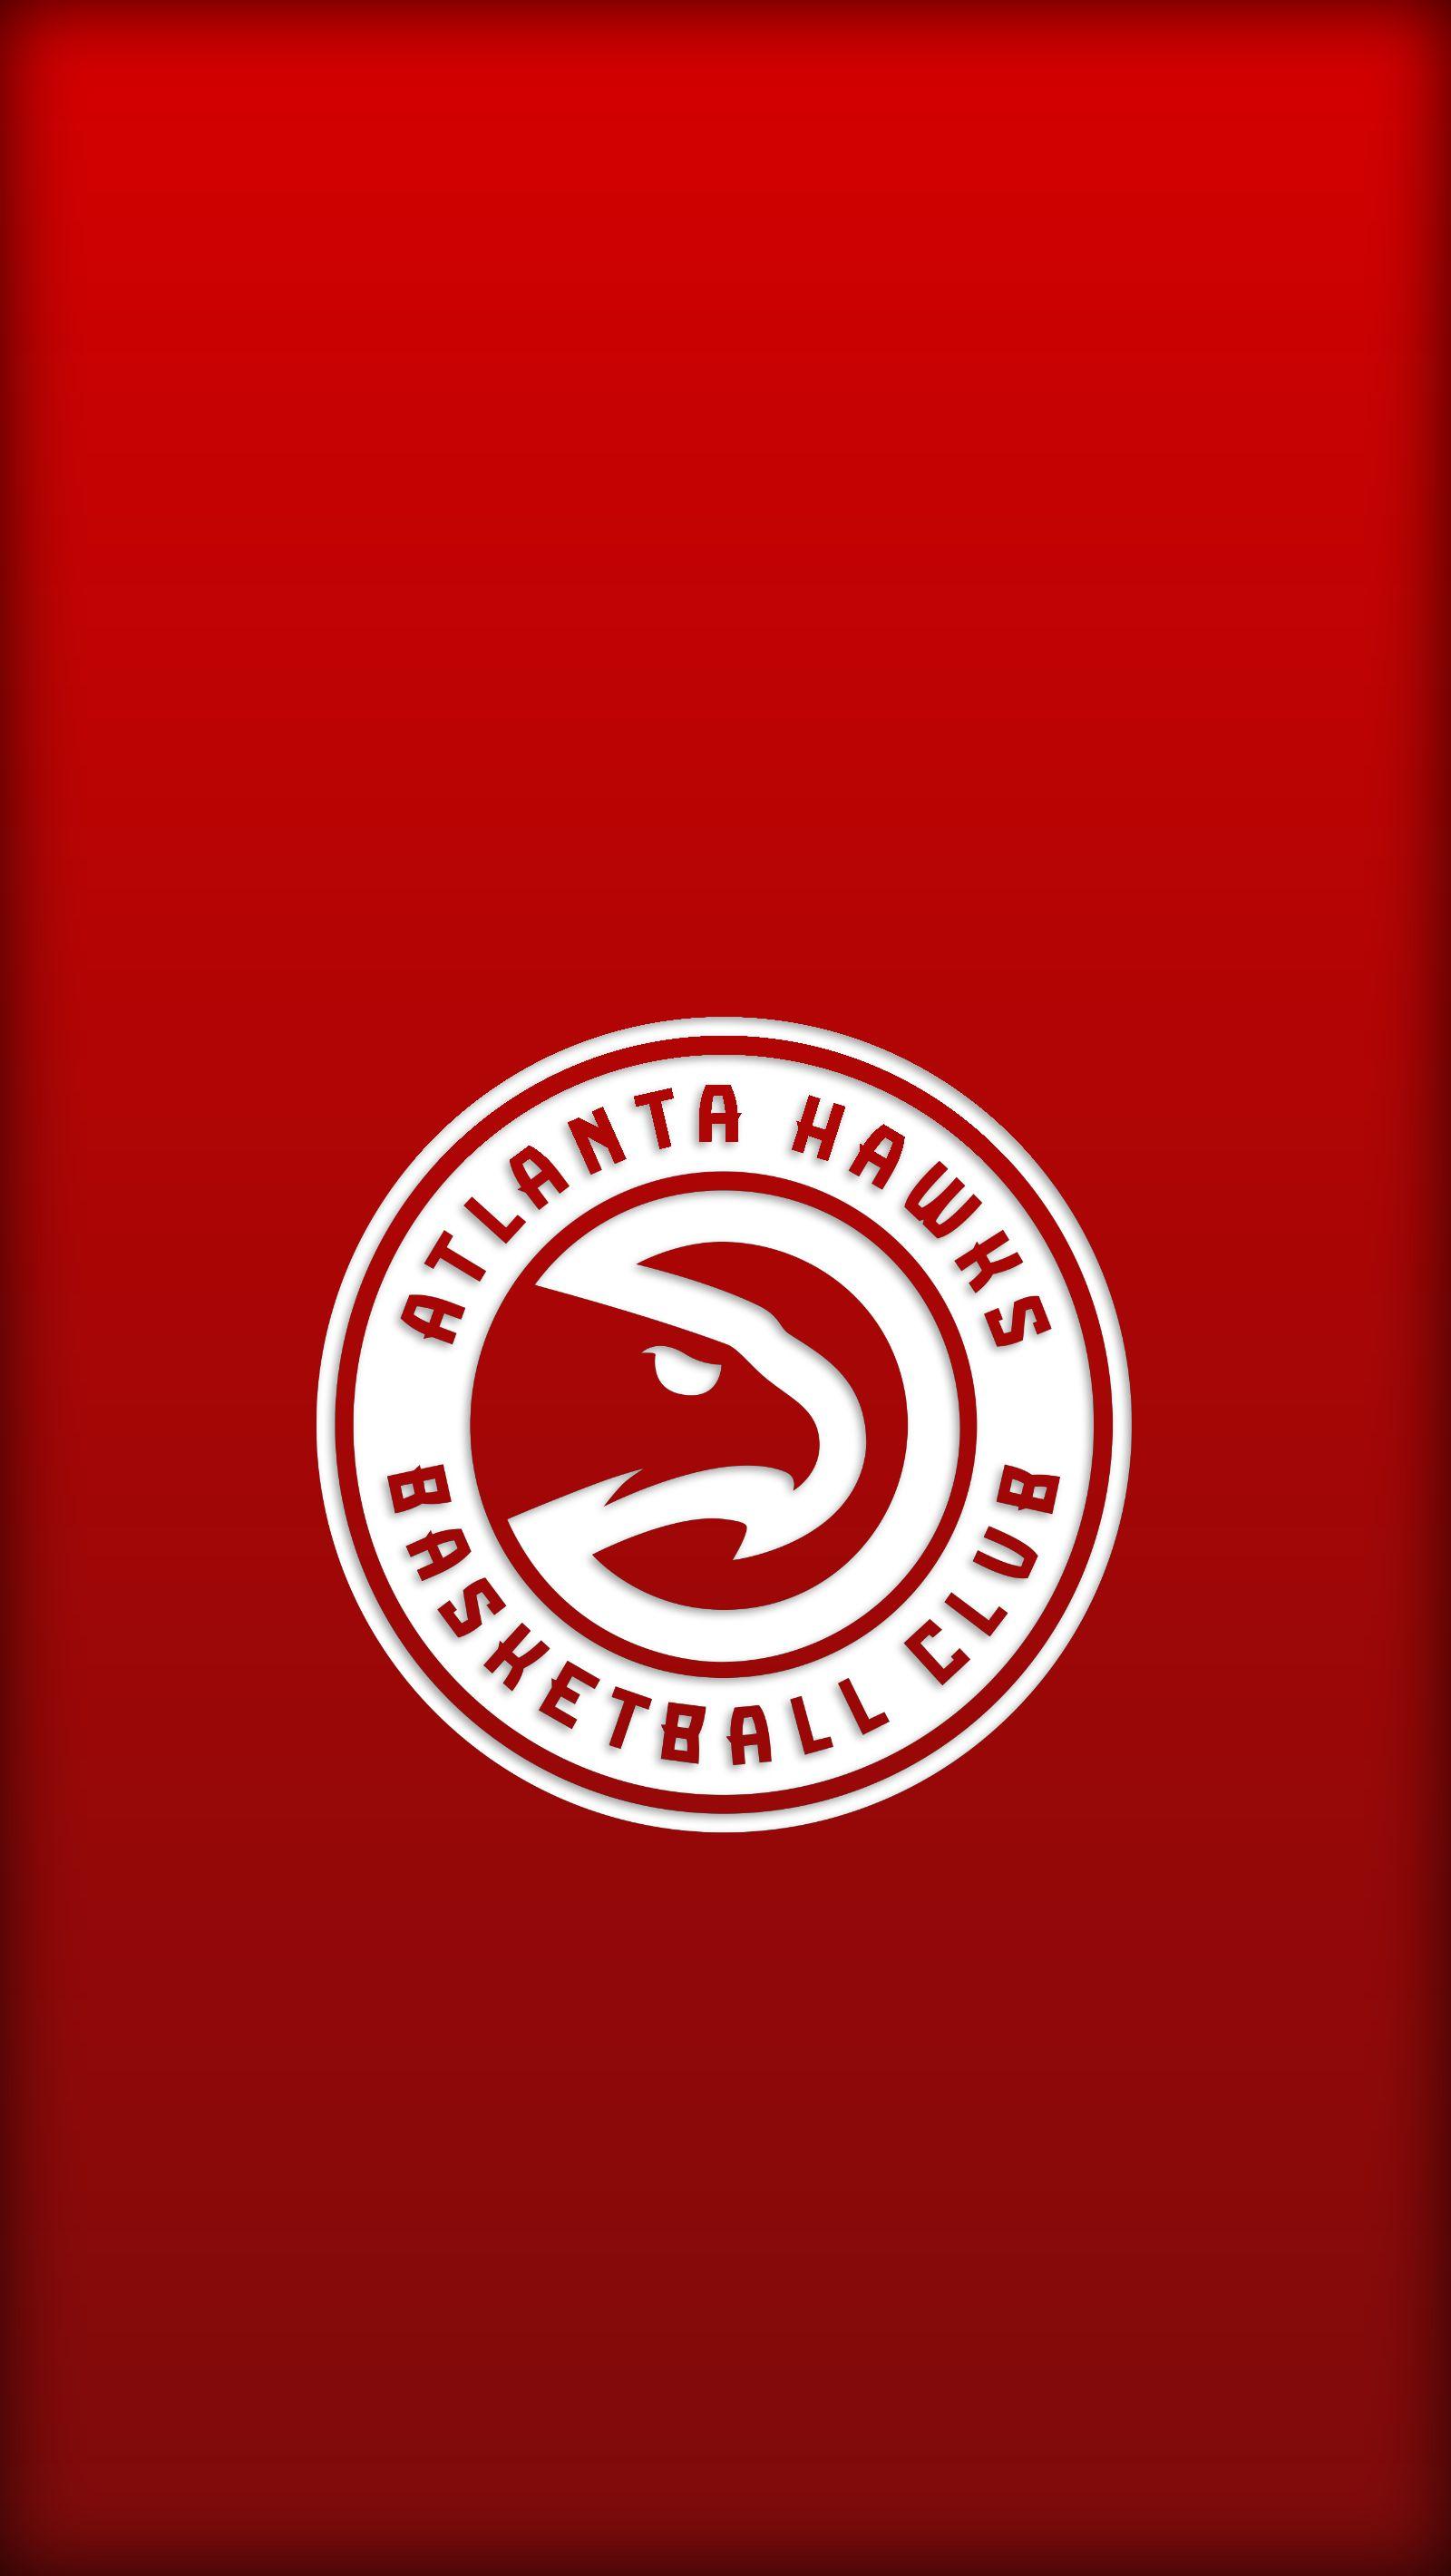 Sportsign Shop Redbubble Atlanta Hawks Atlanta Hawks Basketball Basketball Wallpaper